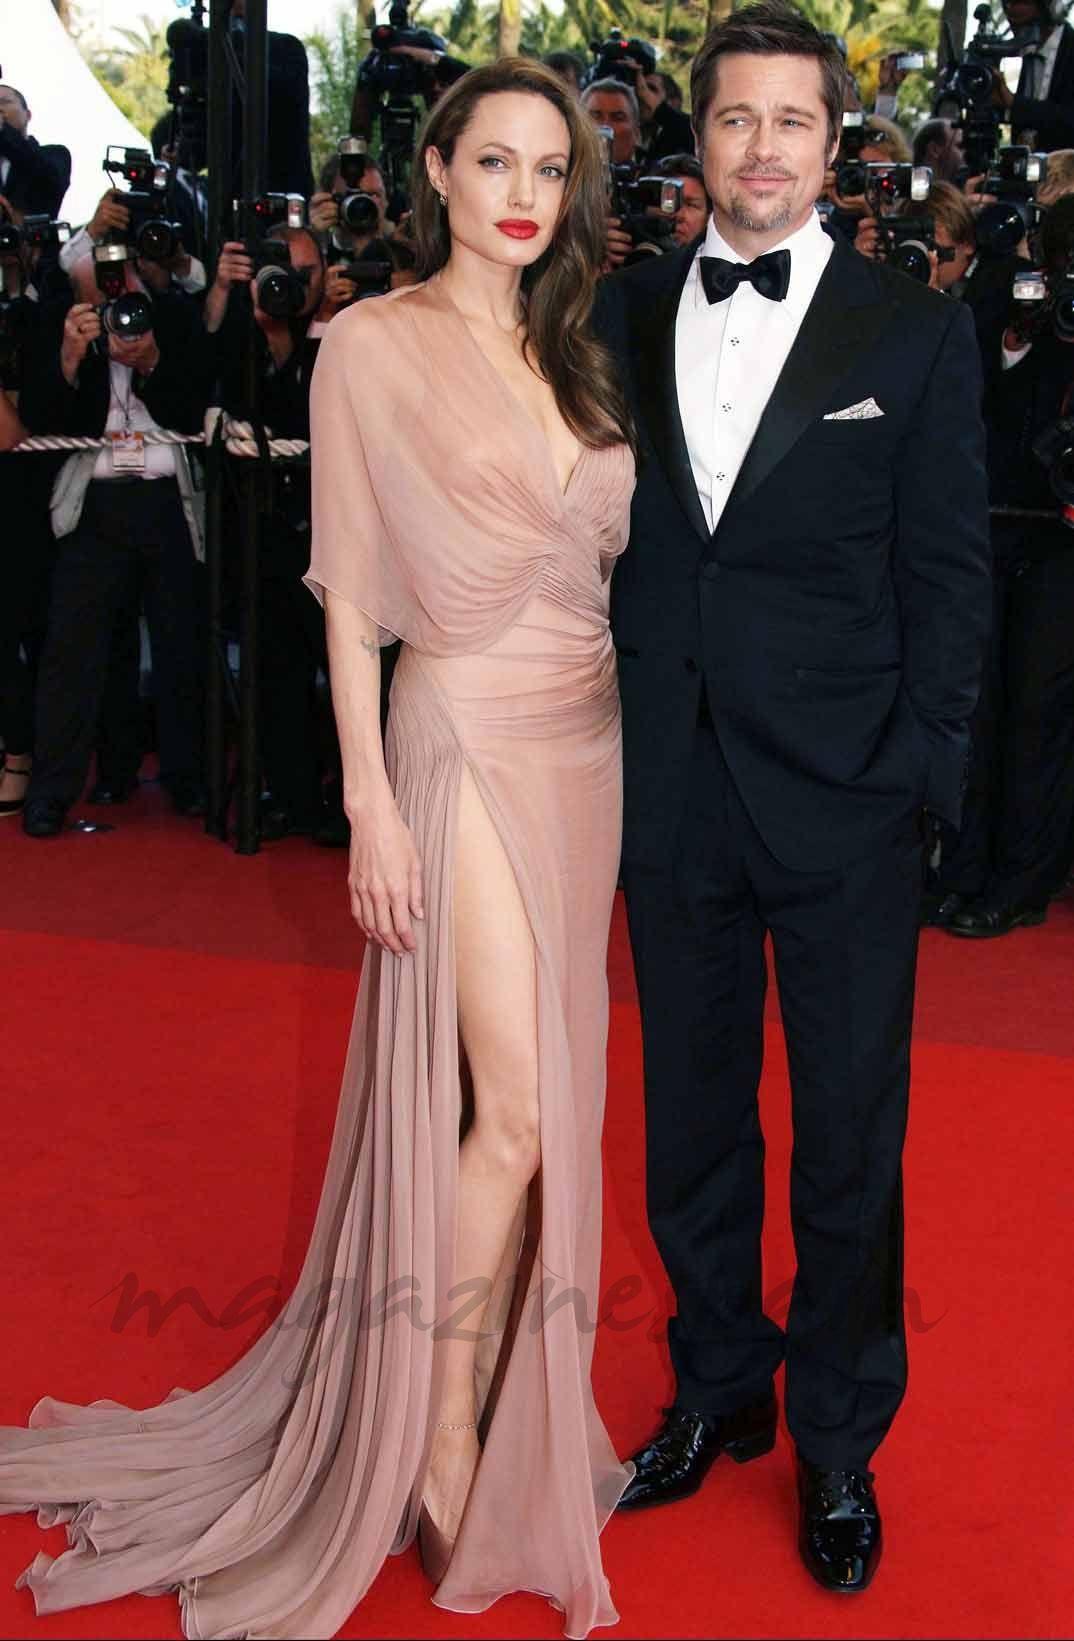 El vestido de novia de Angelina Jolie | Pinterest | Angelina jolie ...